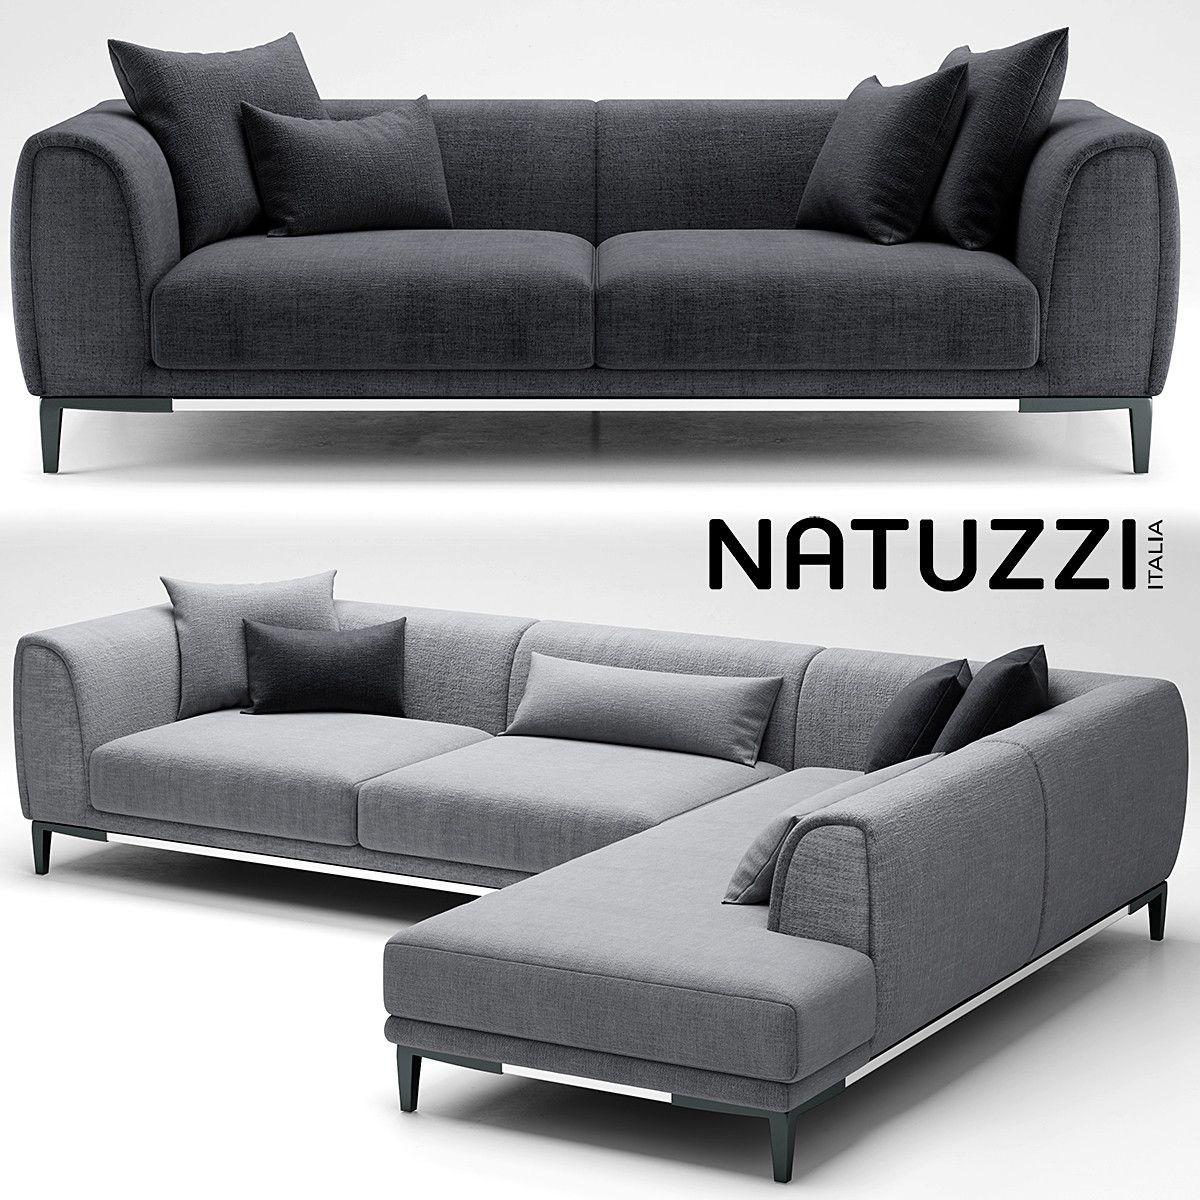 Superb 3D Sofa Natuzzi Trevi Model 3D Model In 2019 Sofa Ibusinesslaw Wood Chair Design Ideas Ibusinesslaworg